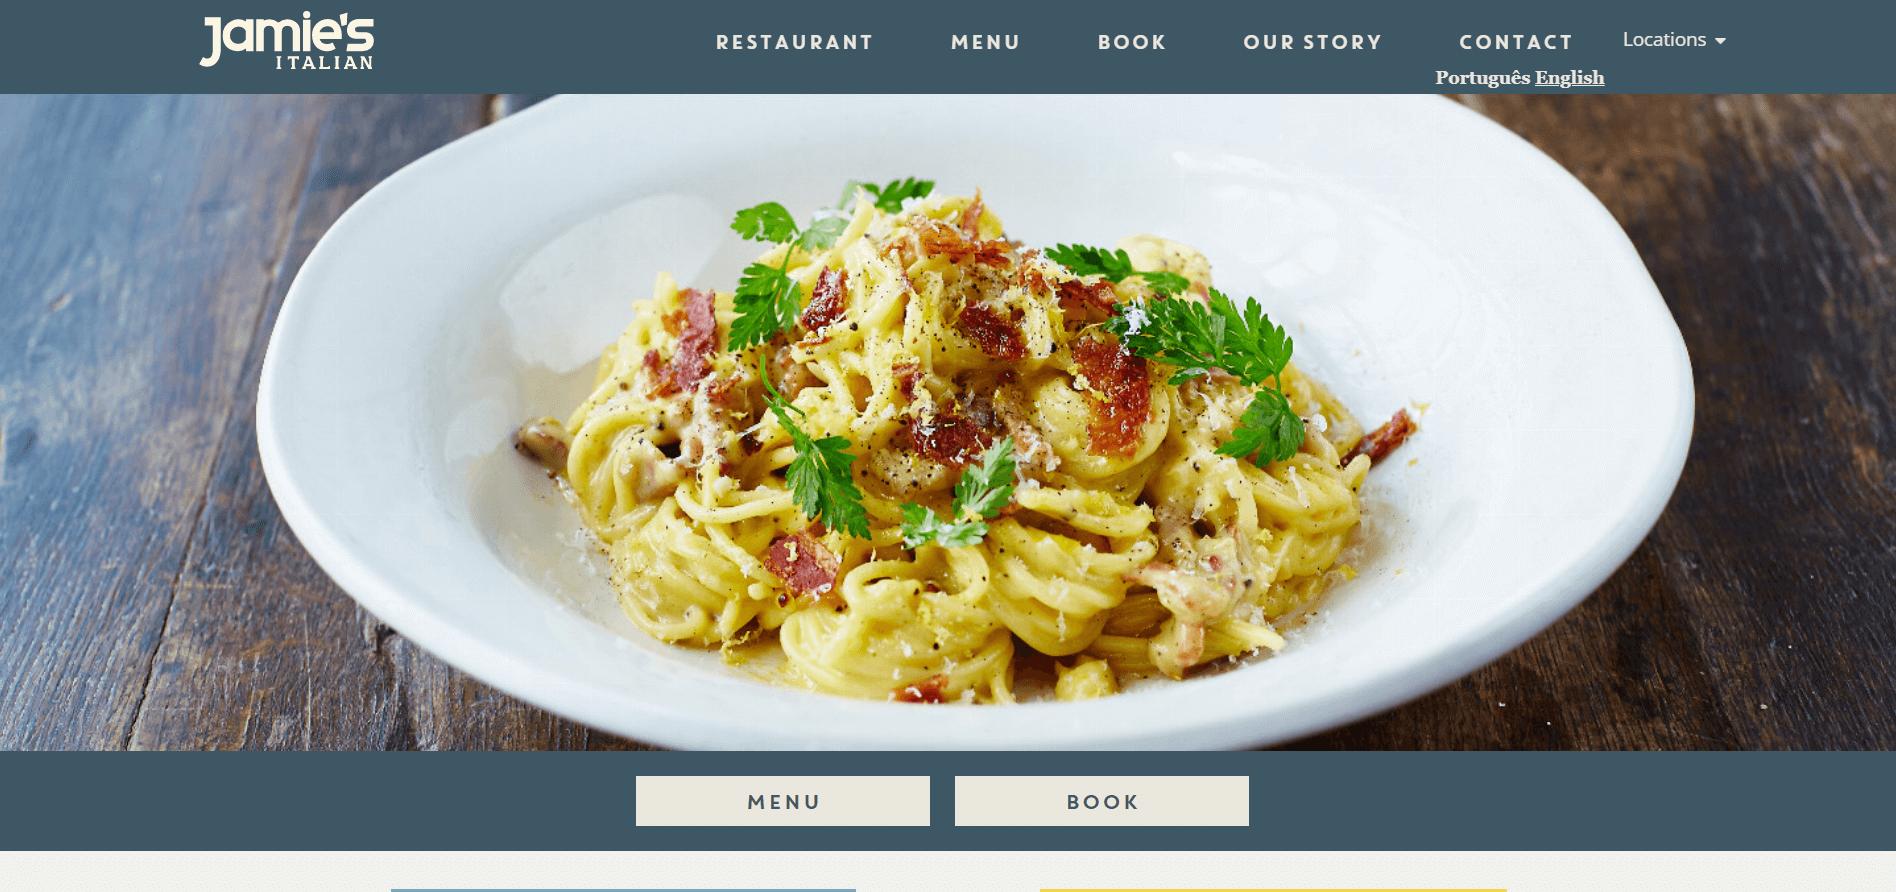 Jamie Oliver´s Restaurant